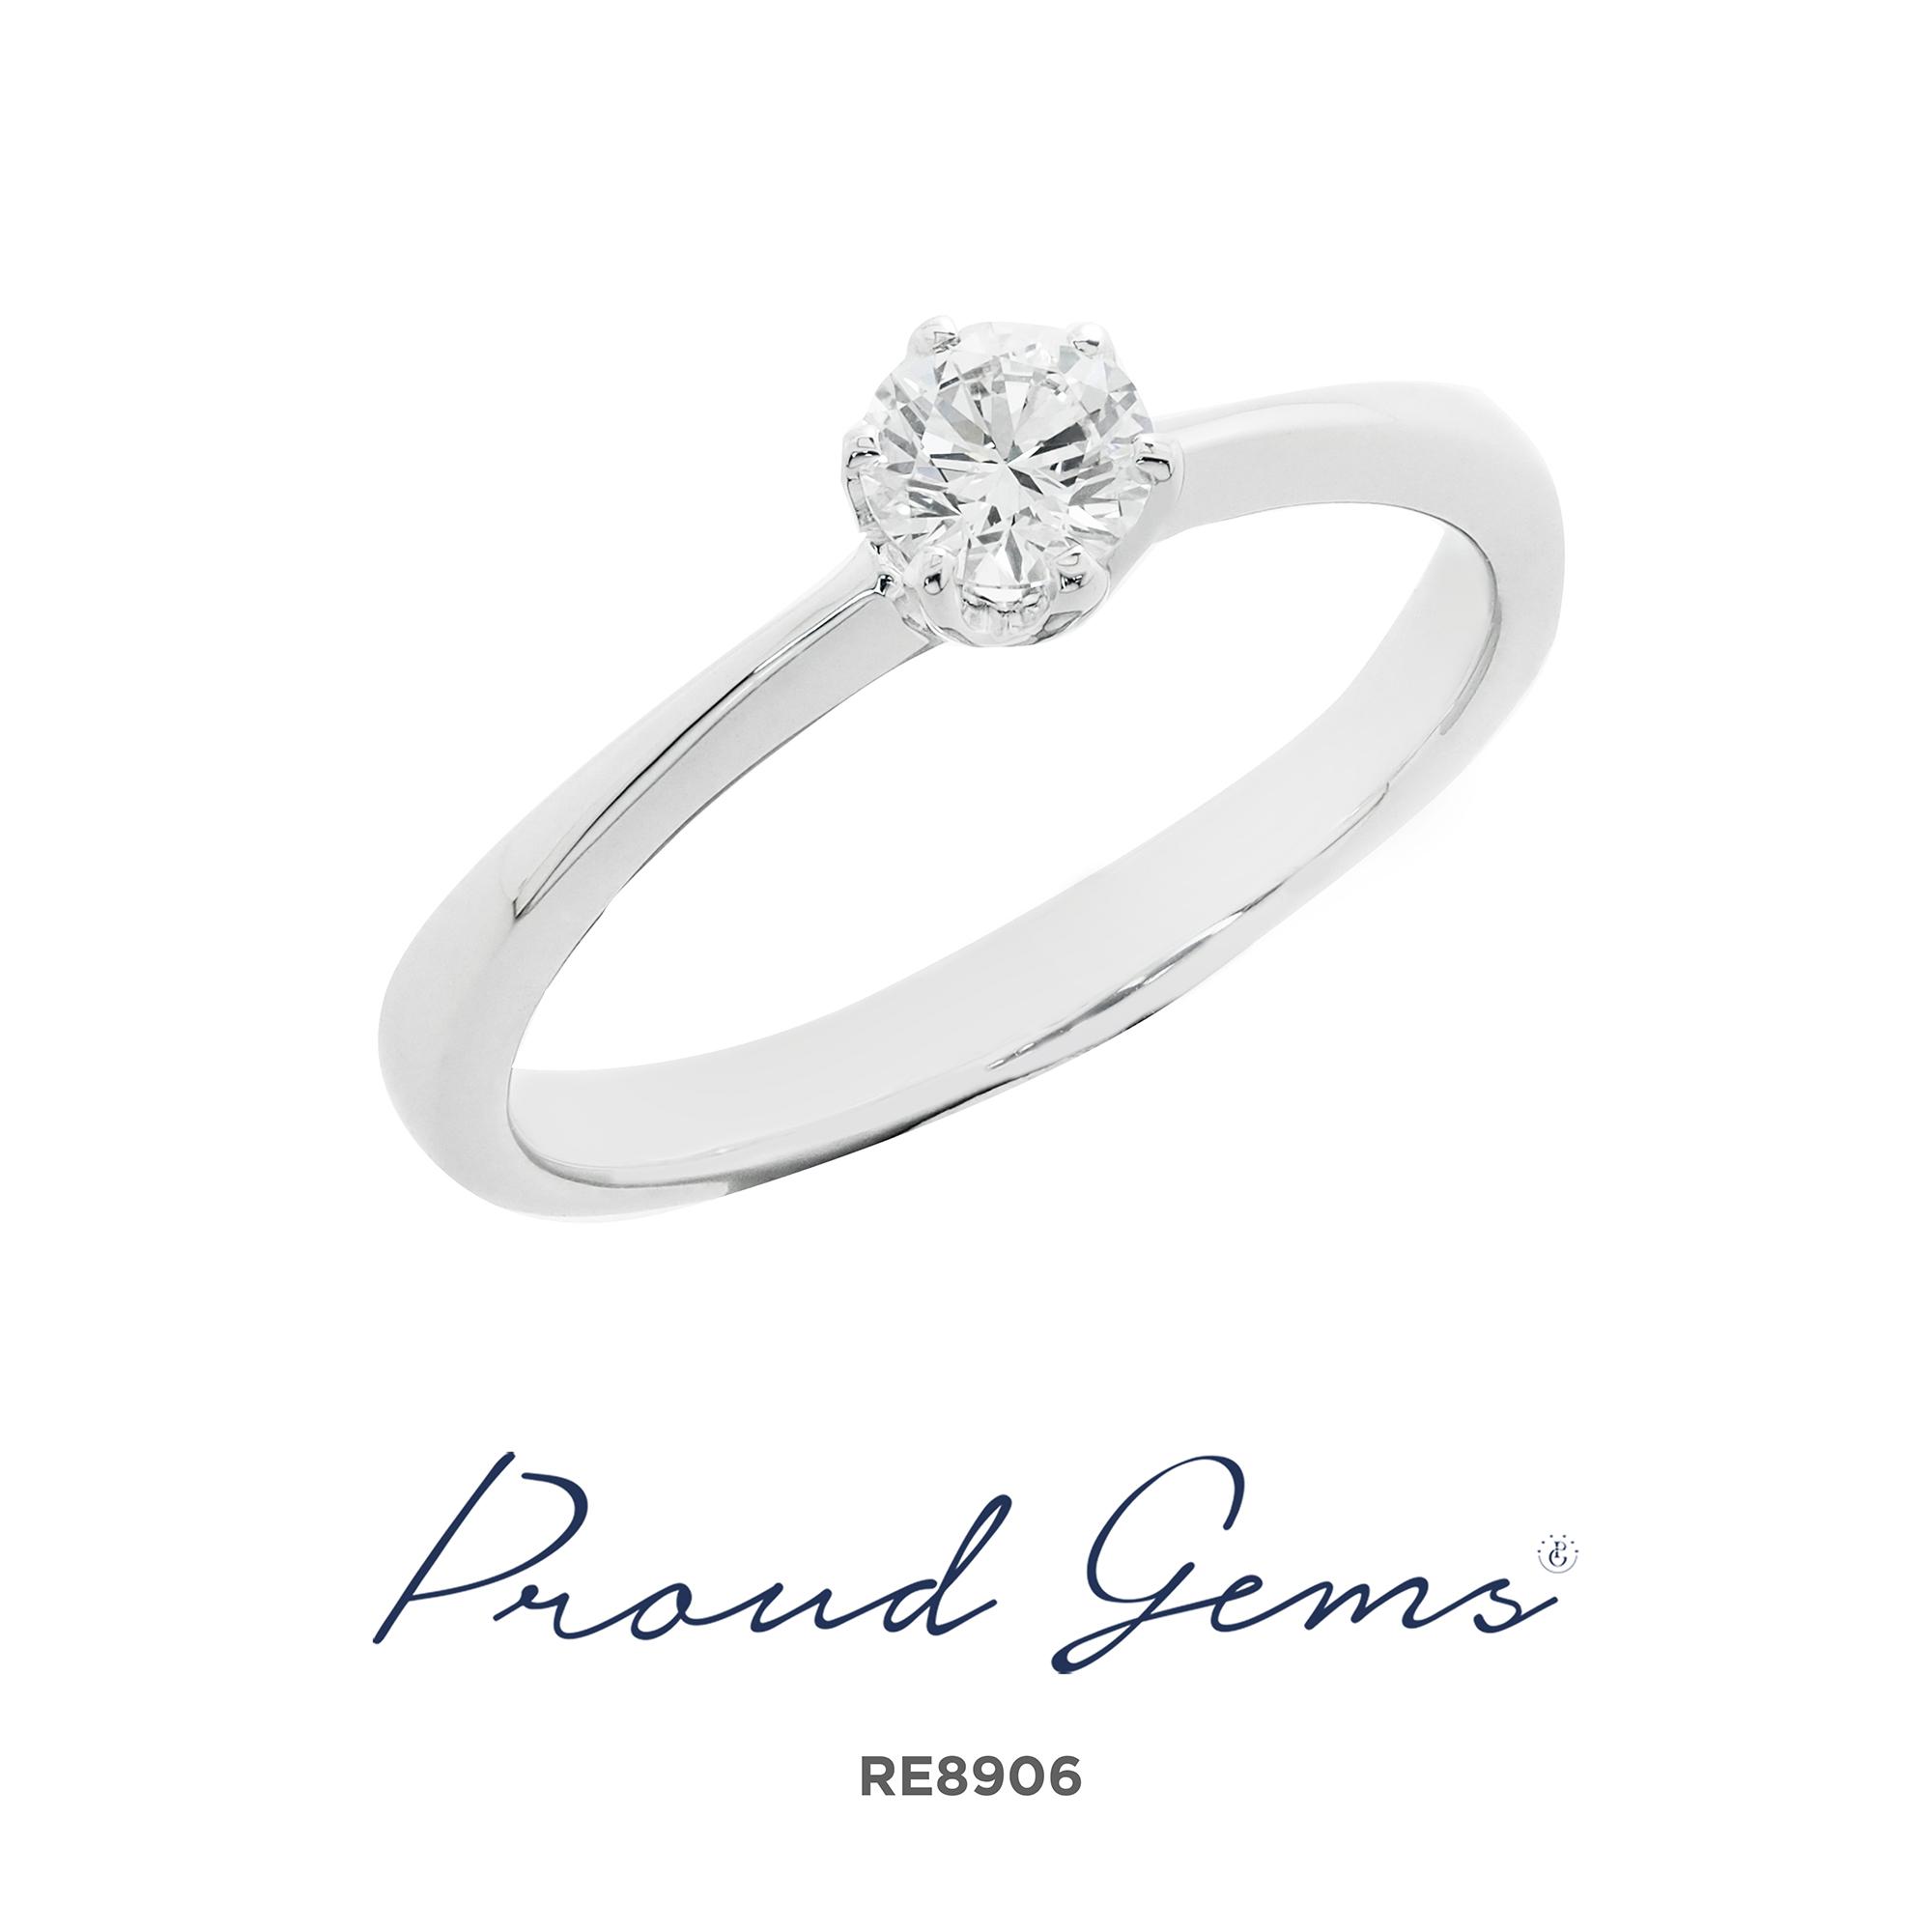 8906RE 3 - แหวนหมั้นเพชร RE9001